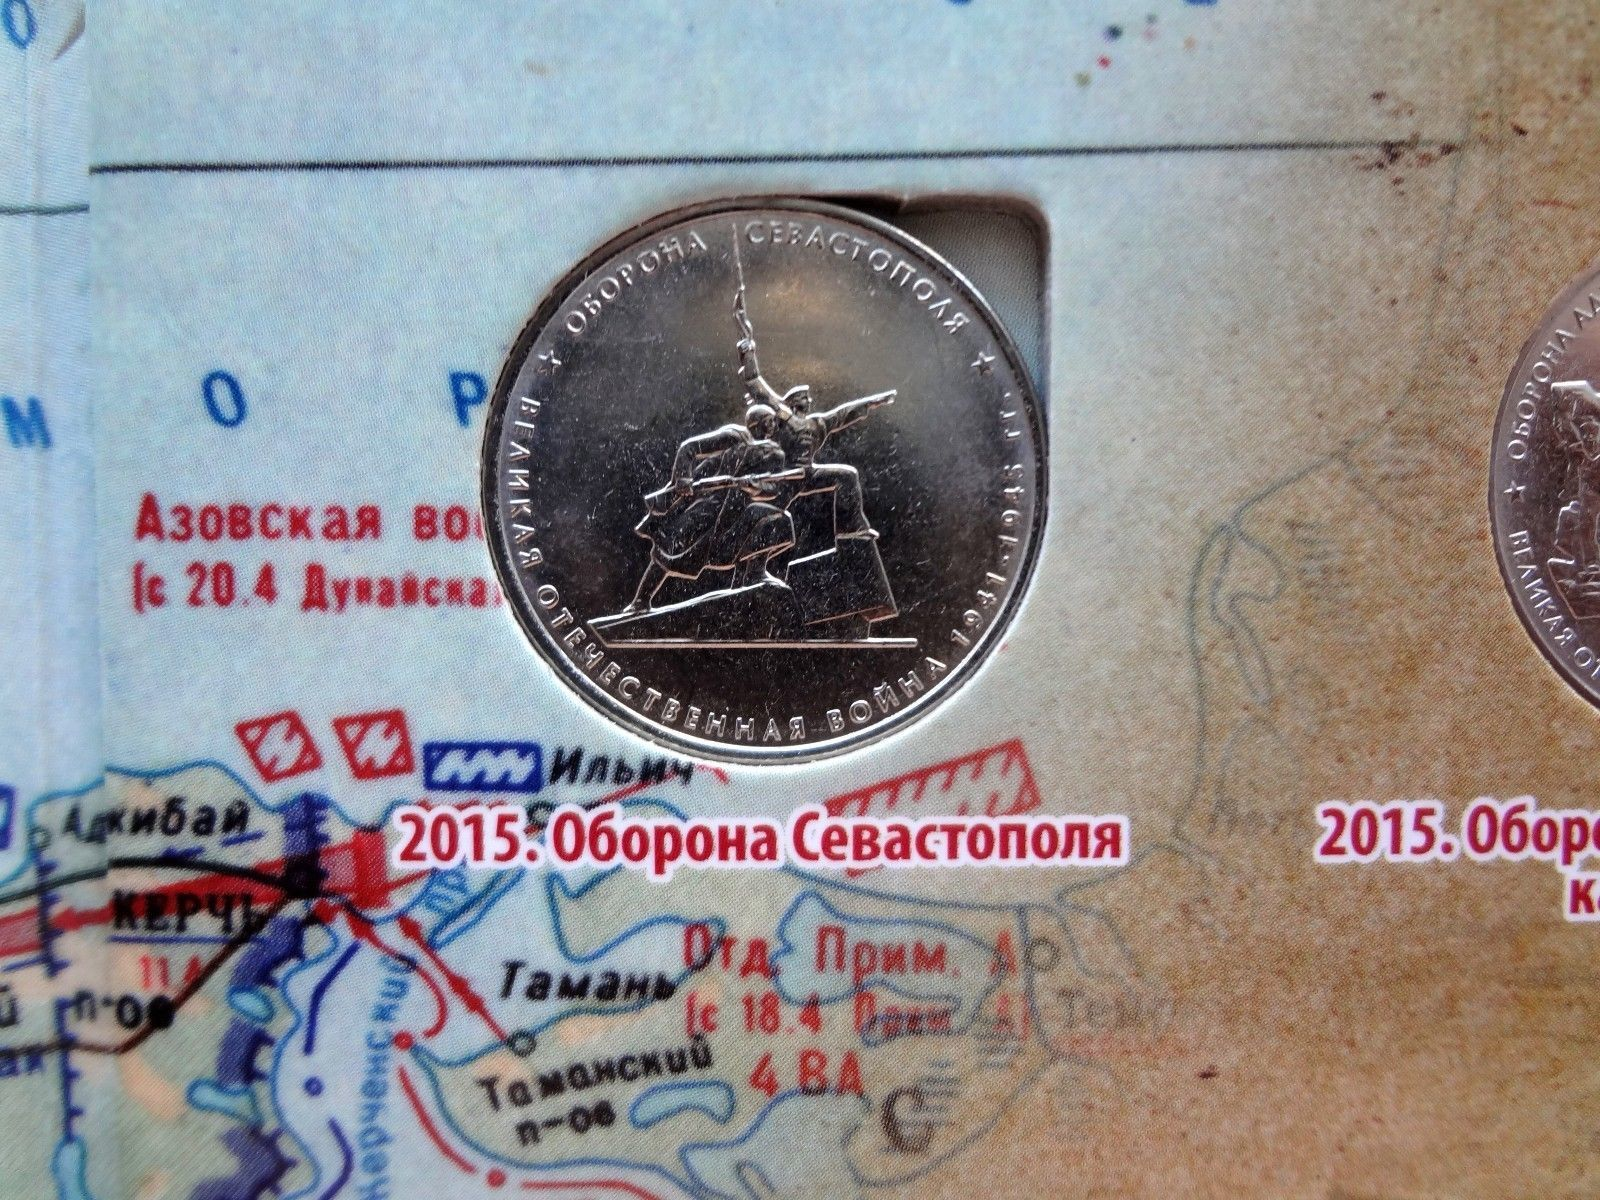 Album RUSSIA//RUSSLAND 5 RUBLES 2015 FULL SET LIBERATION OF THE CRIMEA UNC